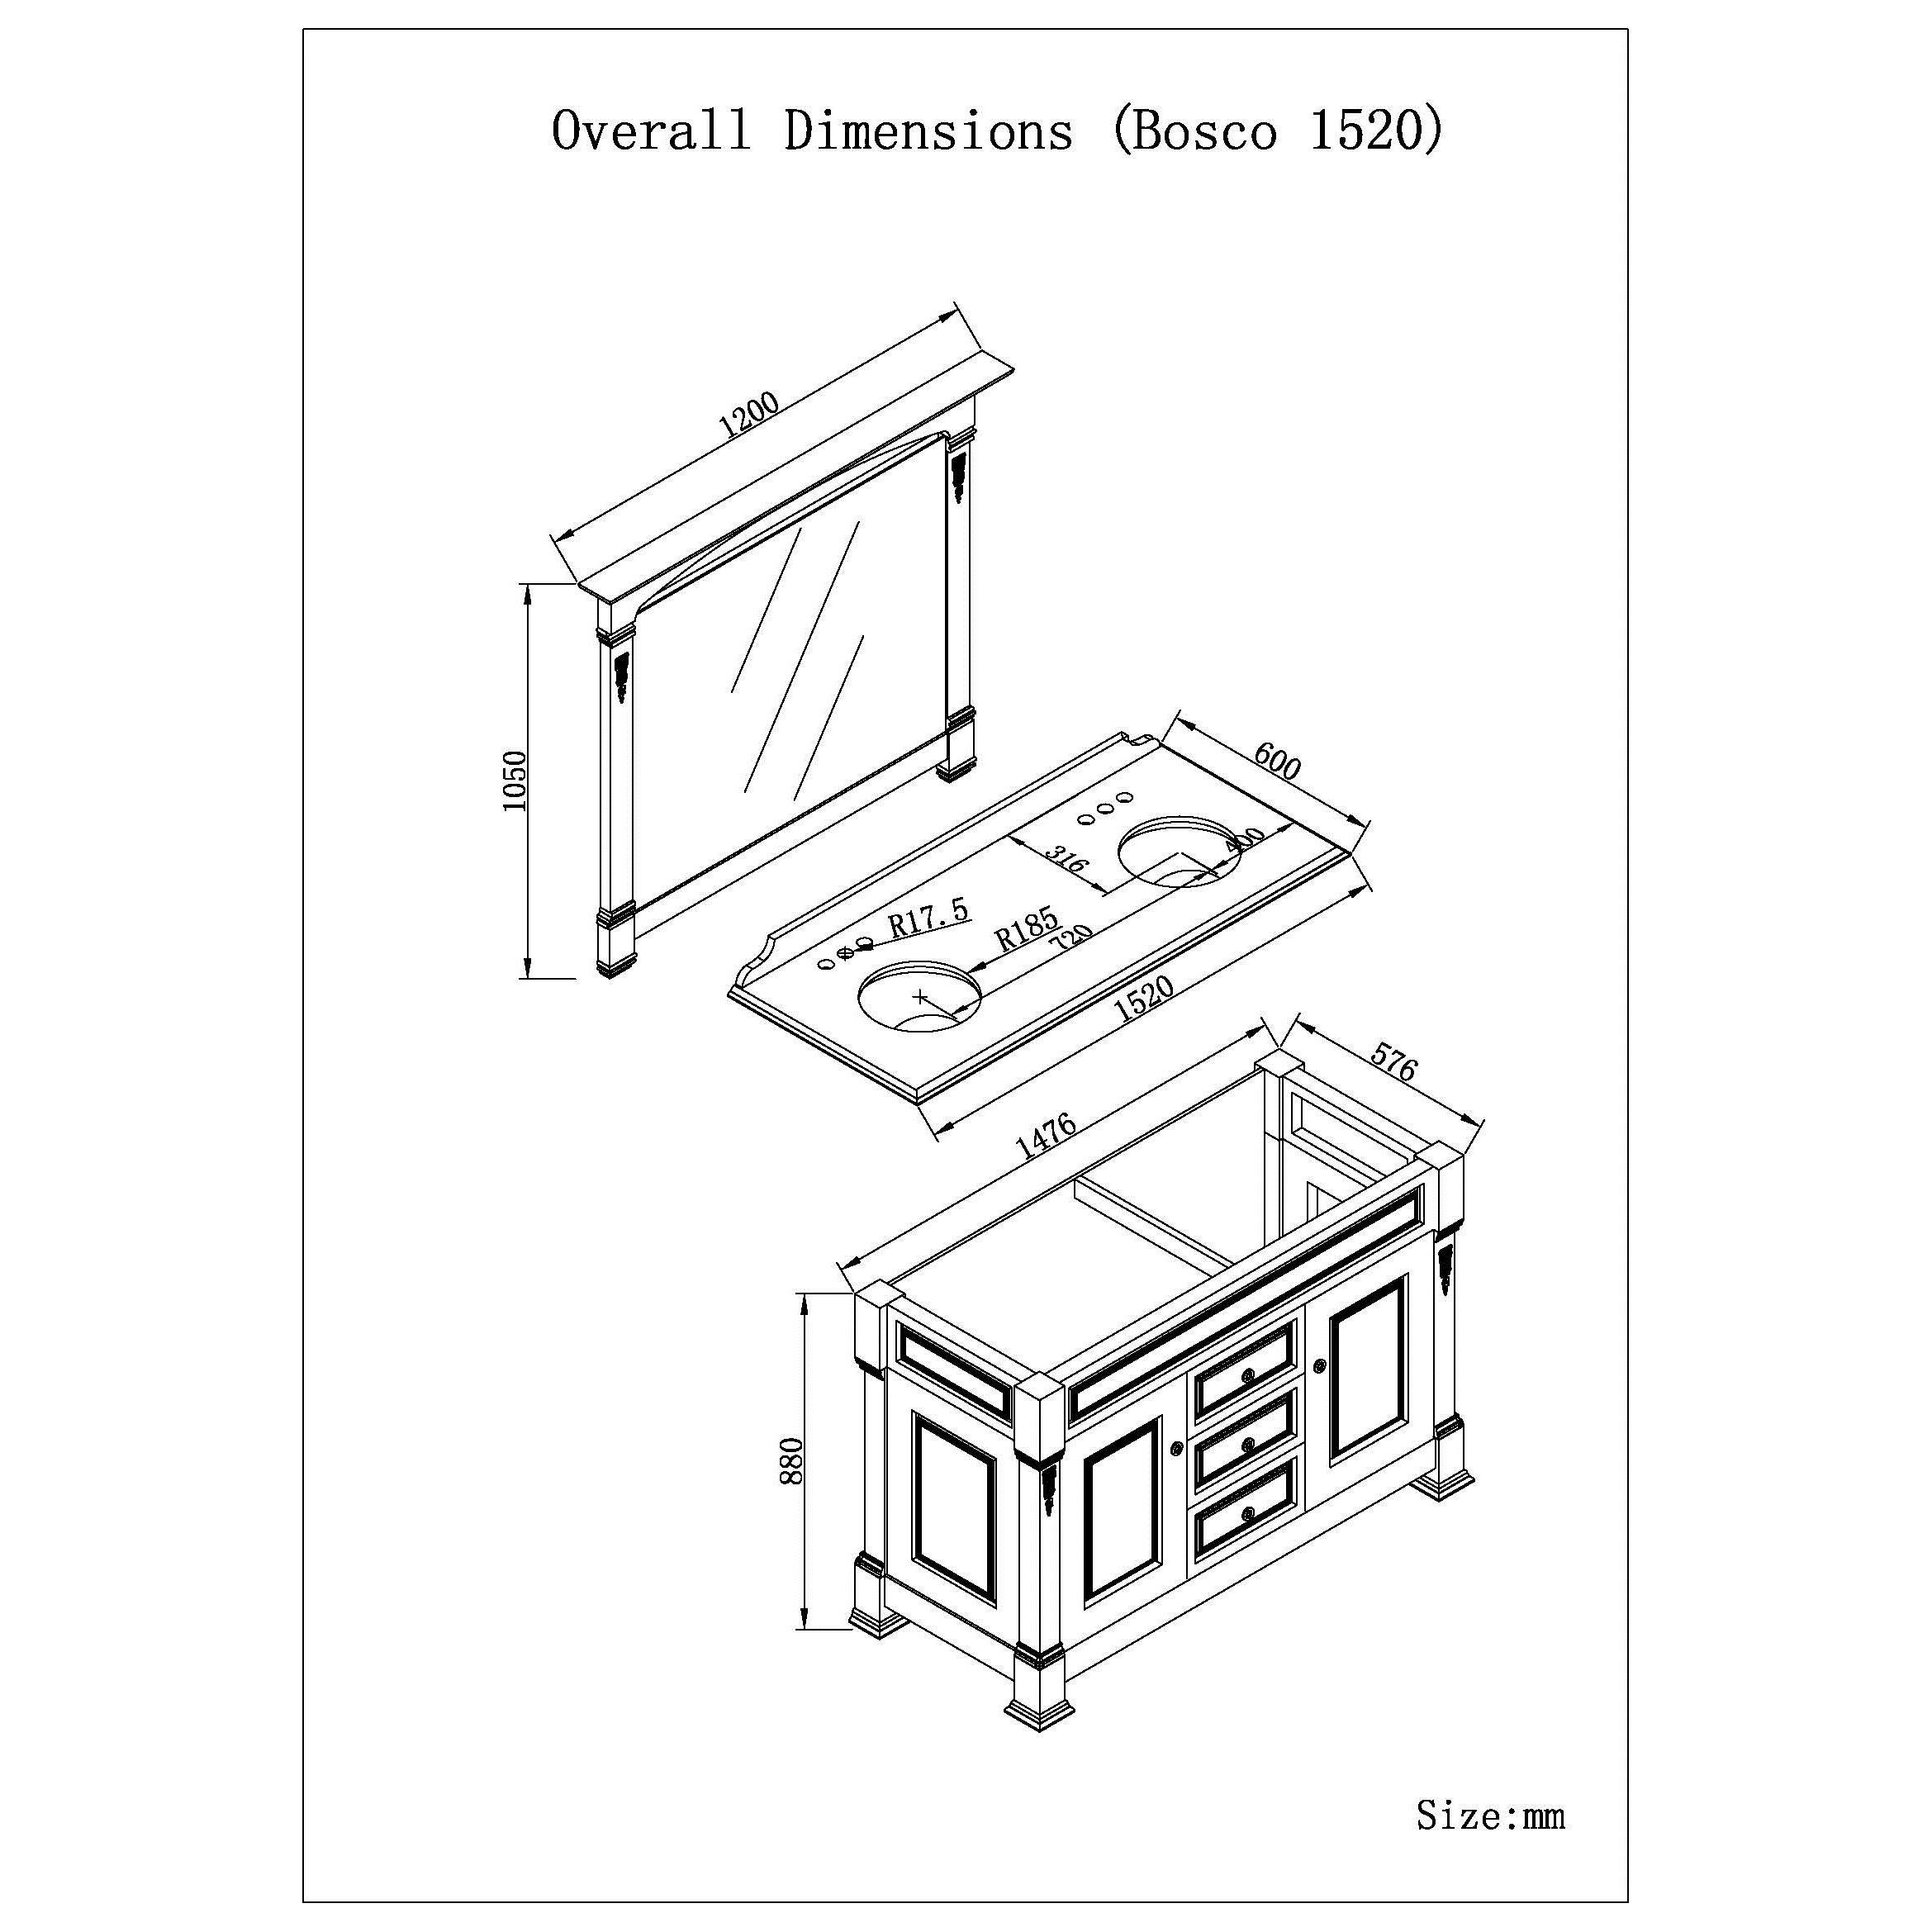 Wiring A Doorbell Transformer Diagram Uk Solidfonts - Wiring diagram doorbell transformer